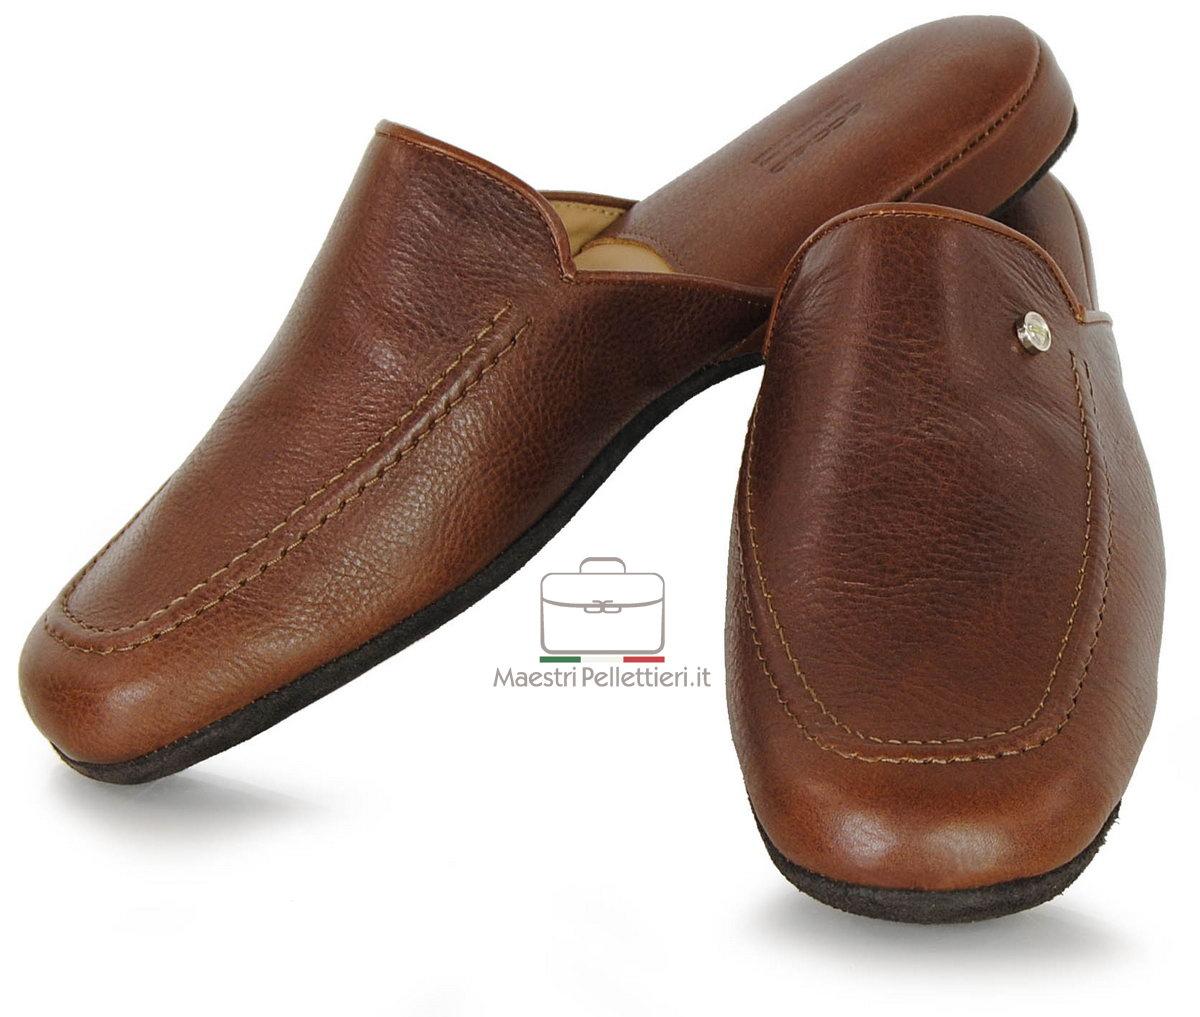 Pantofole da uomo in pelle - artigianali made in Italy